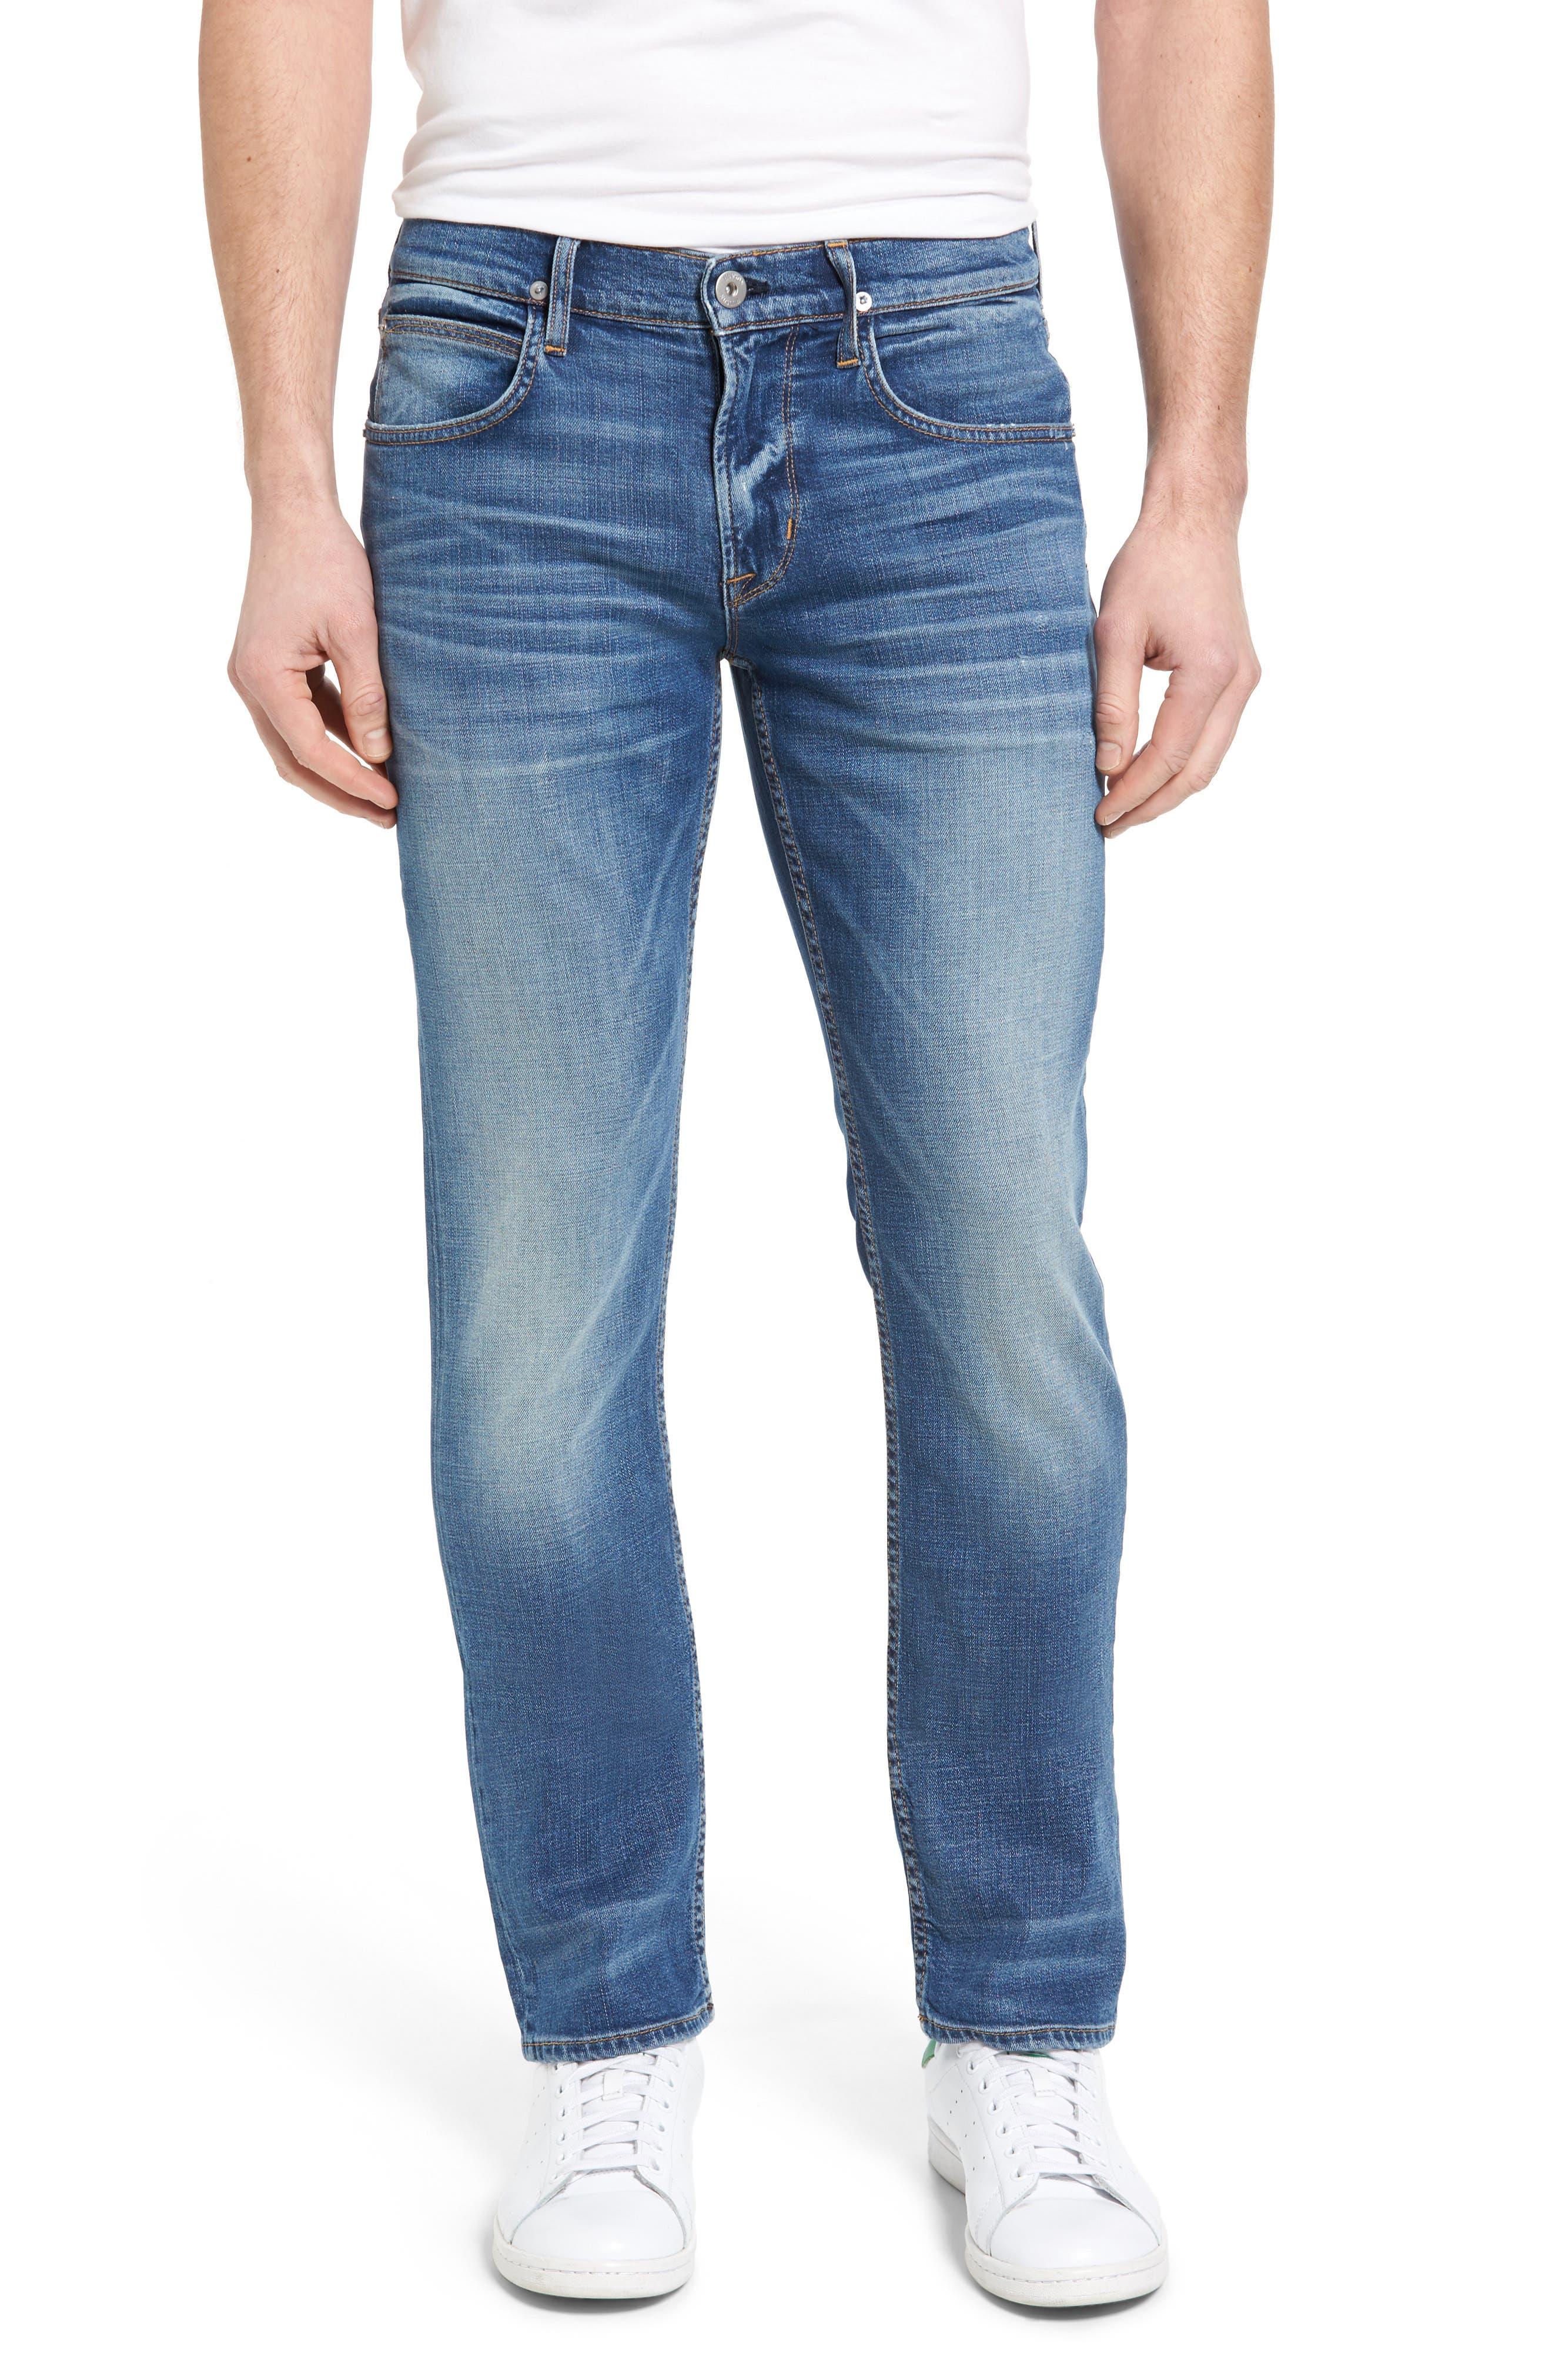 Byron Slim Straight Leg Jeans,                         Main,                         color, 453